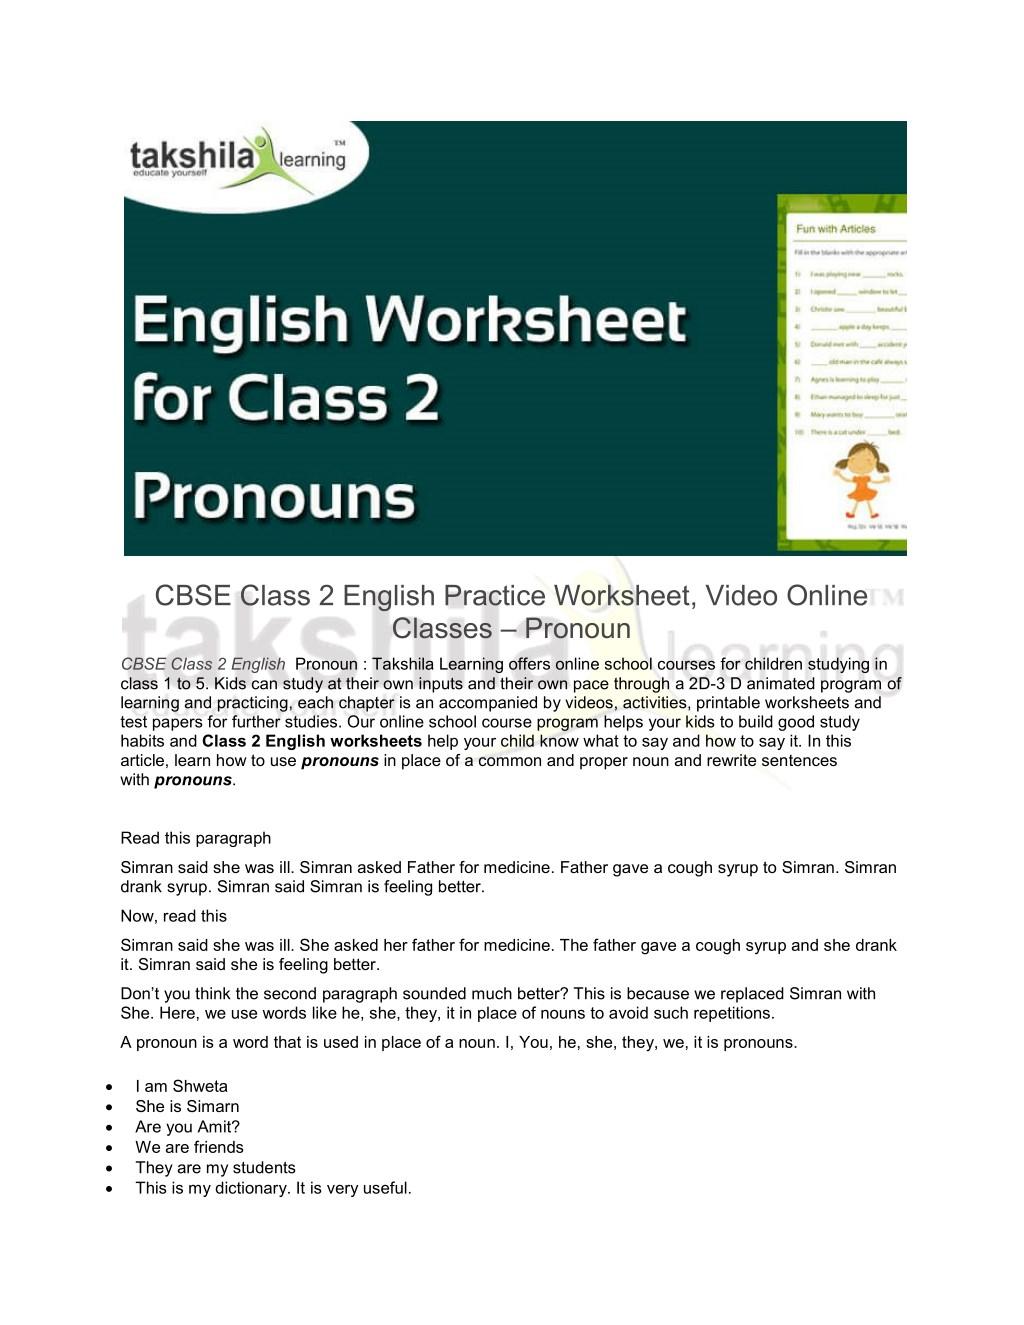 - PPT - CBSE Class 2 English Practice Worksheet - Pronouns